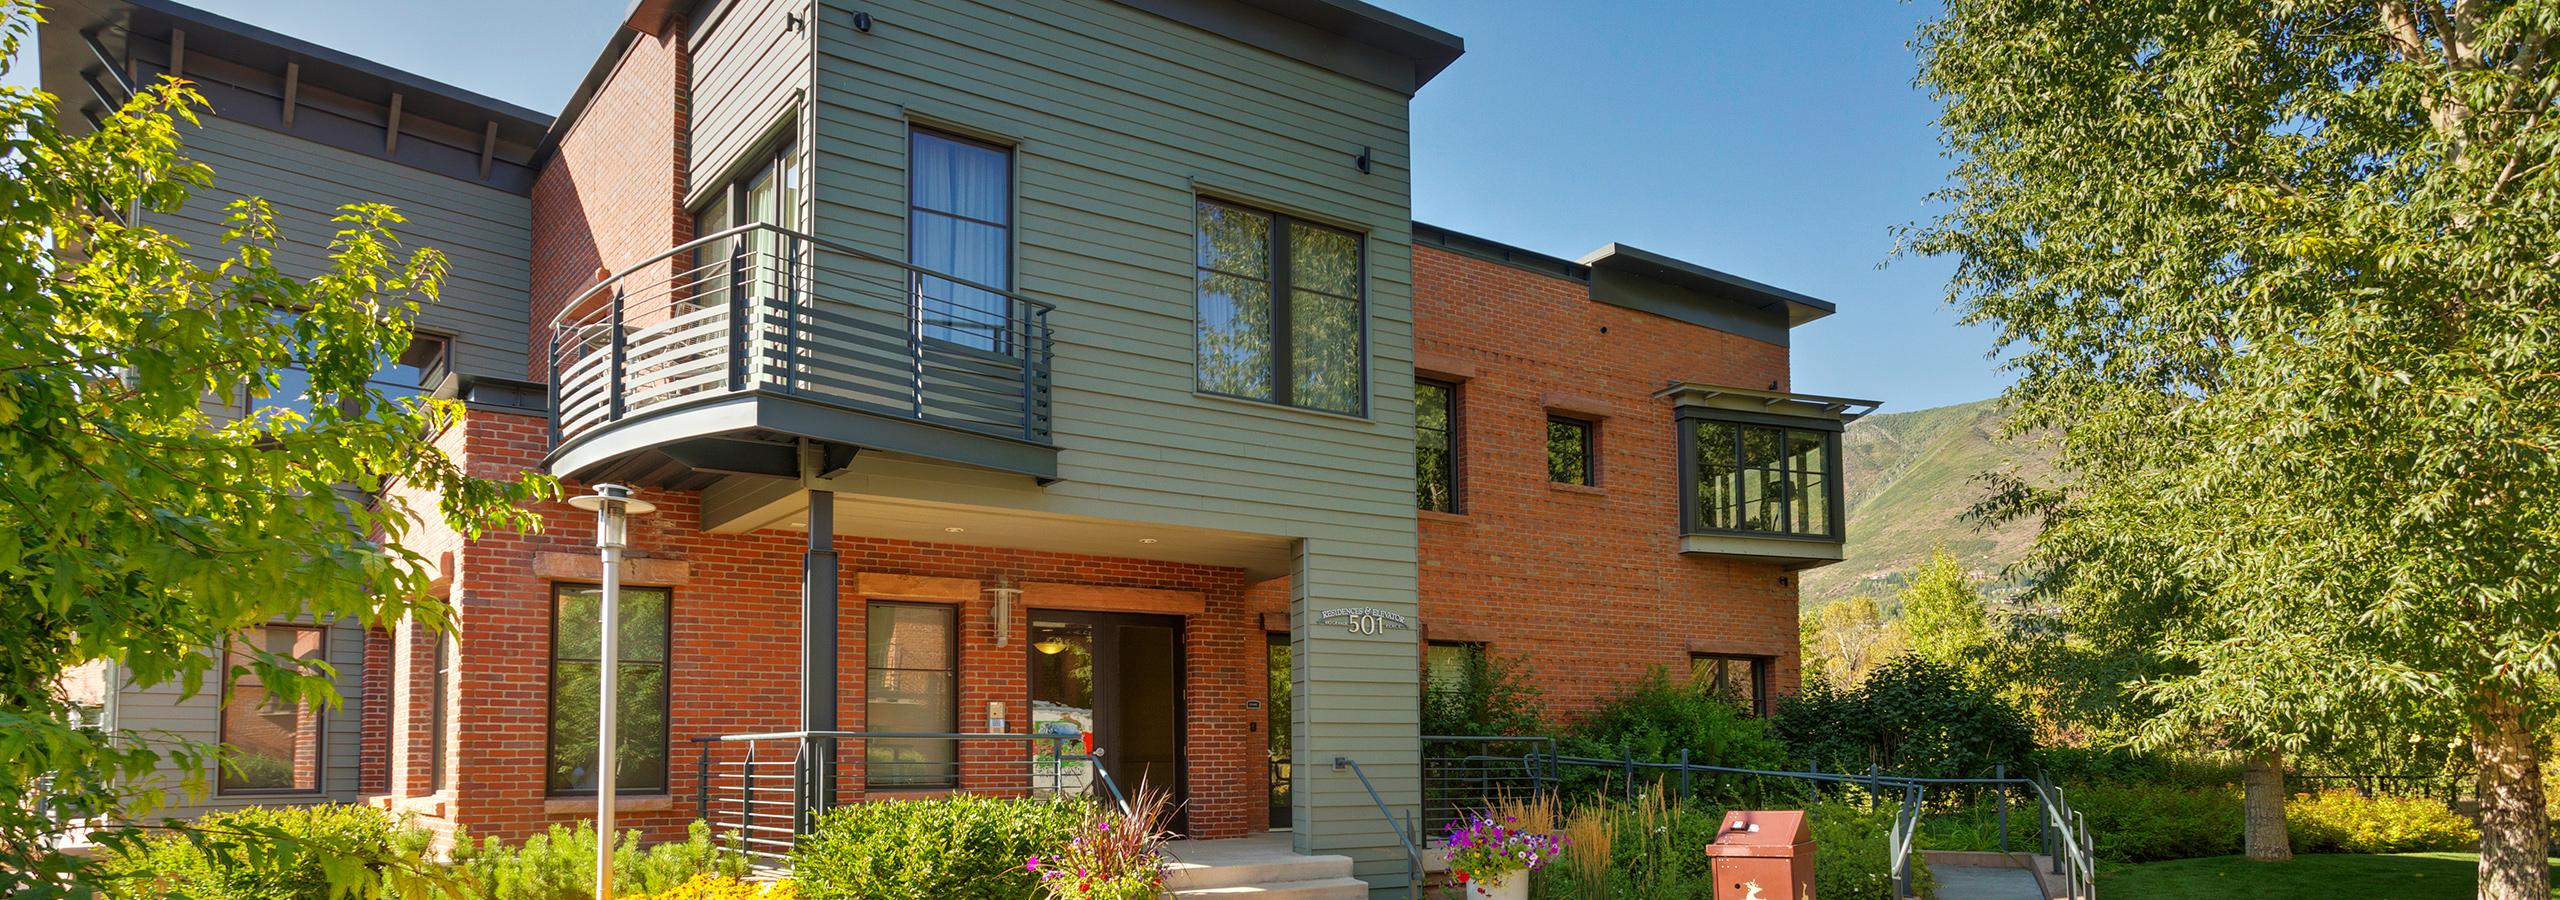 Obermeyer Place Condo Rentals